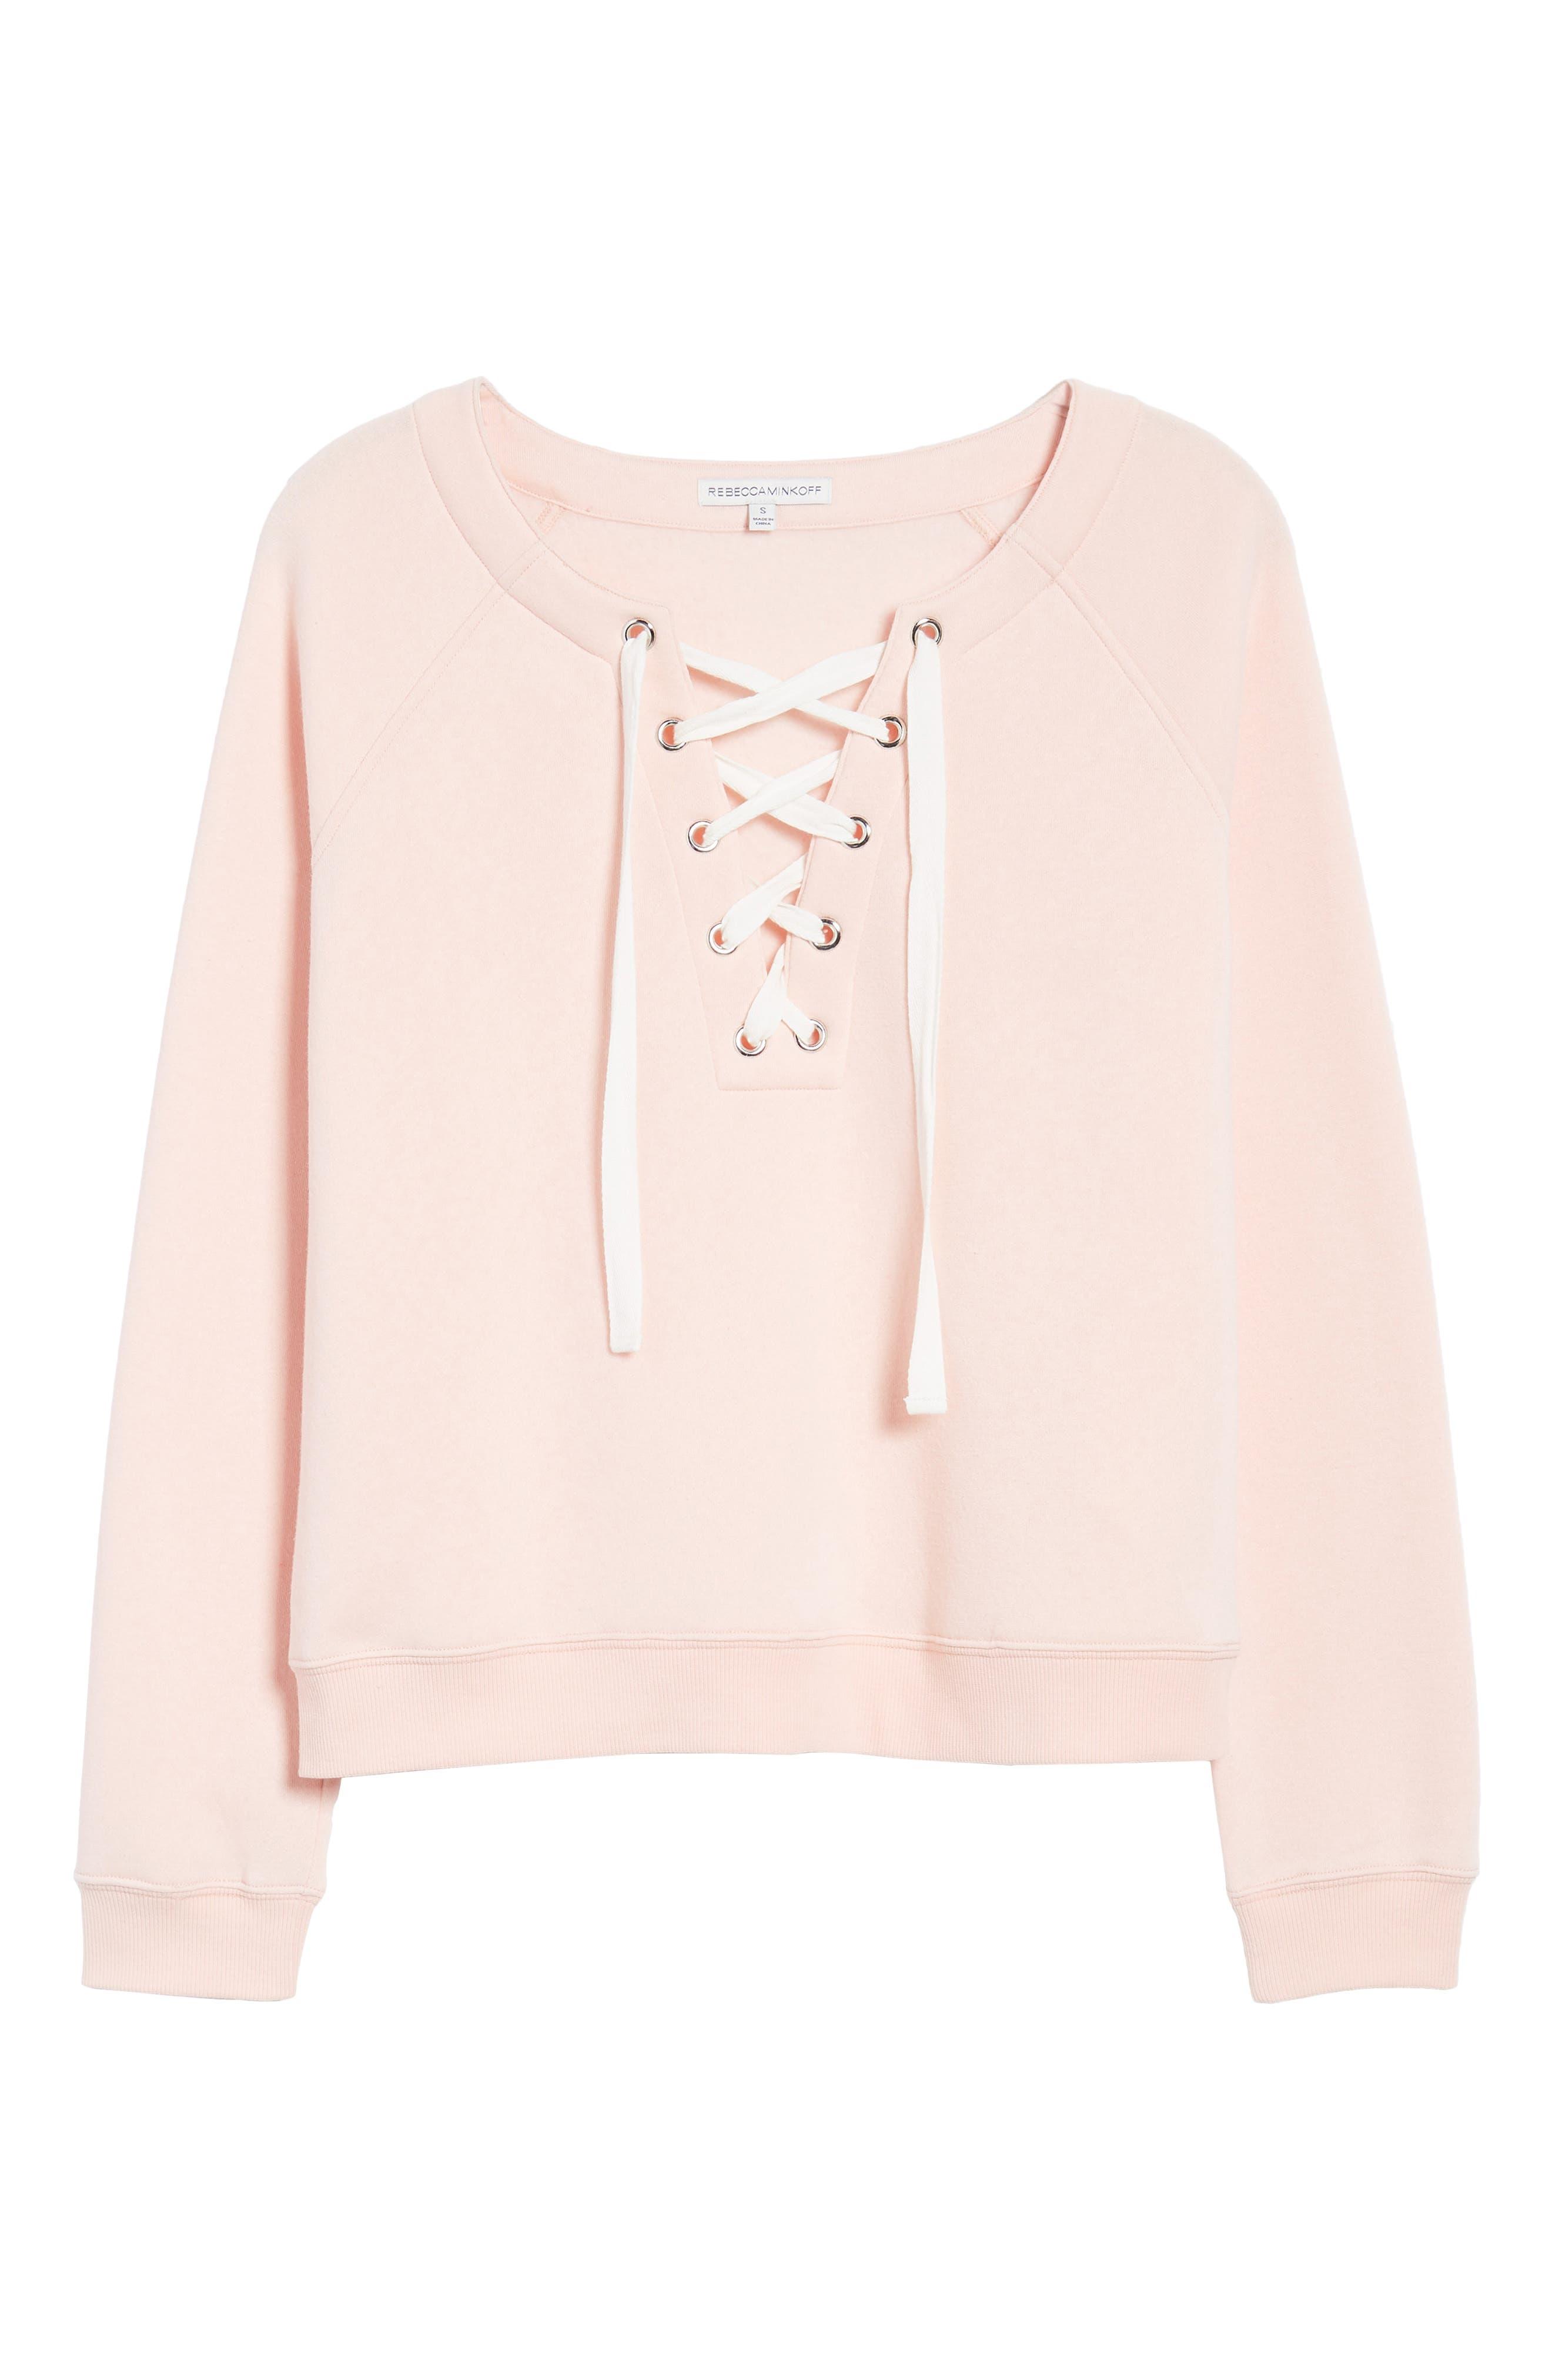 Raquel Sweatshirt,                         Main,                         color, Light Pink